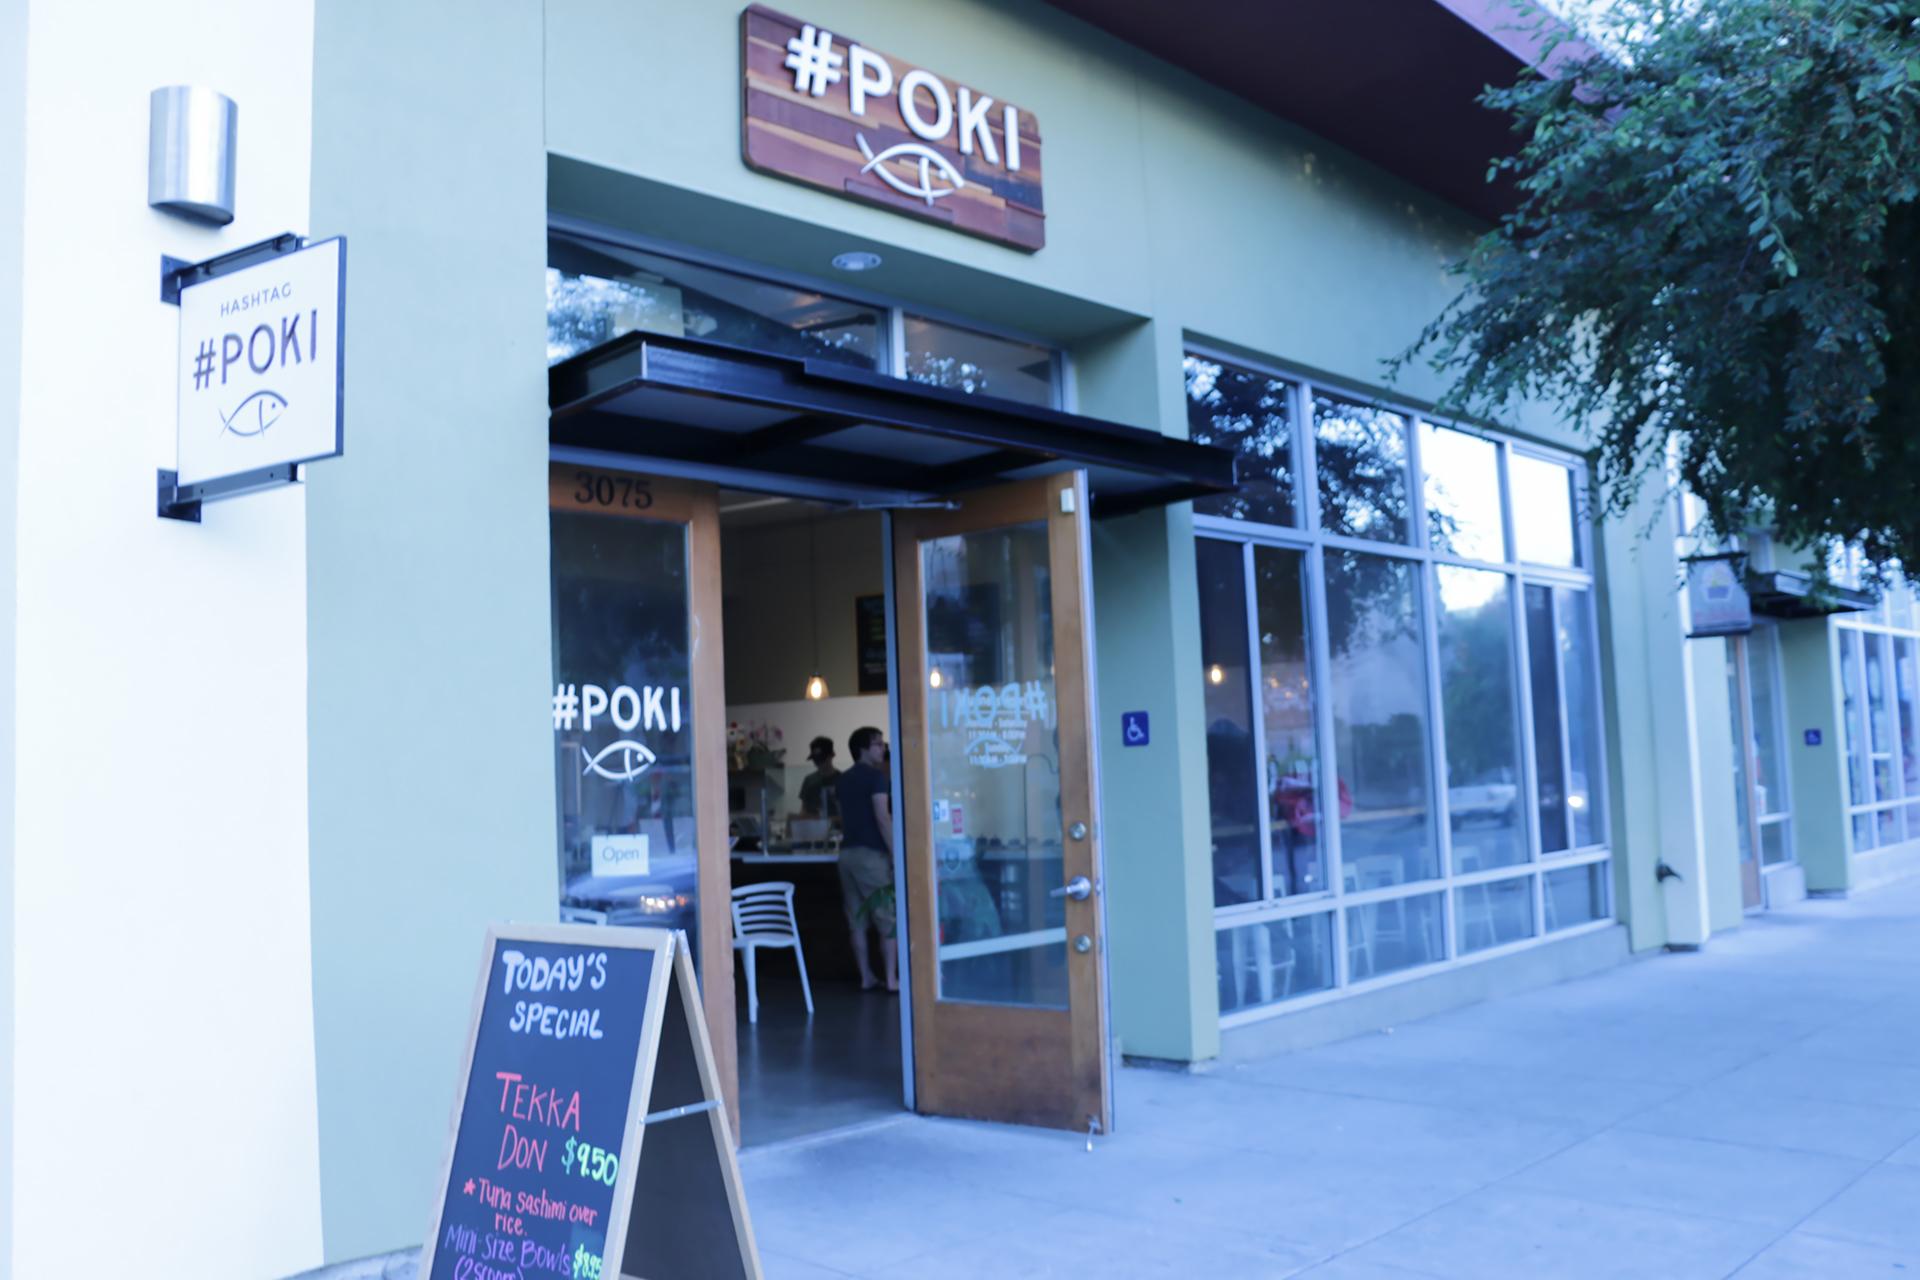 Hashtag Poki in South Berkeley.